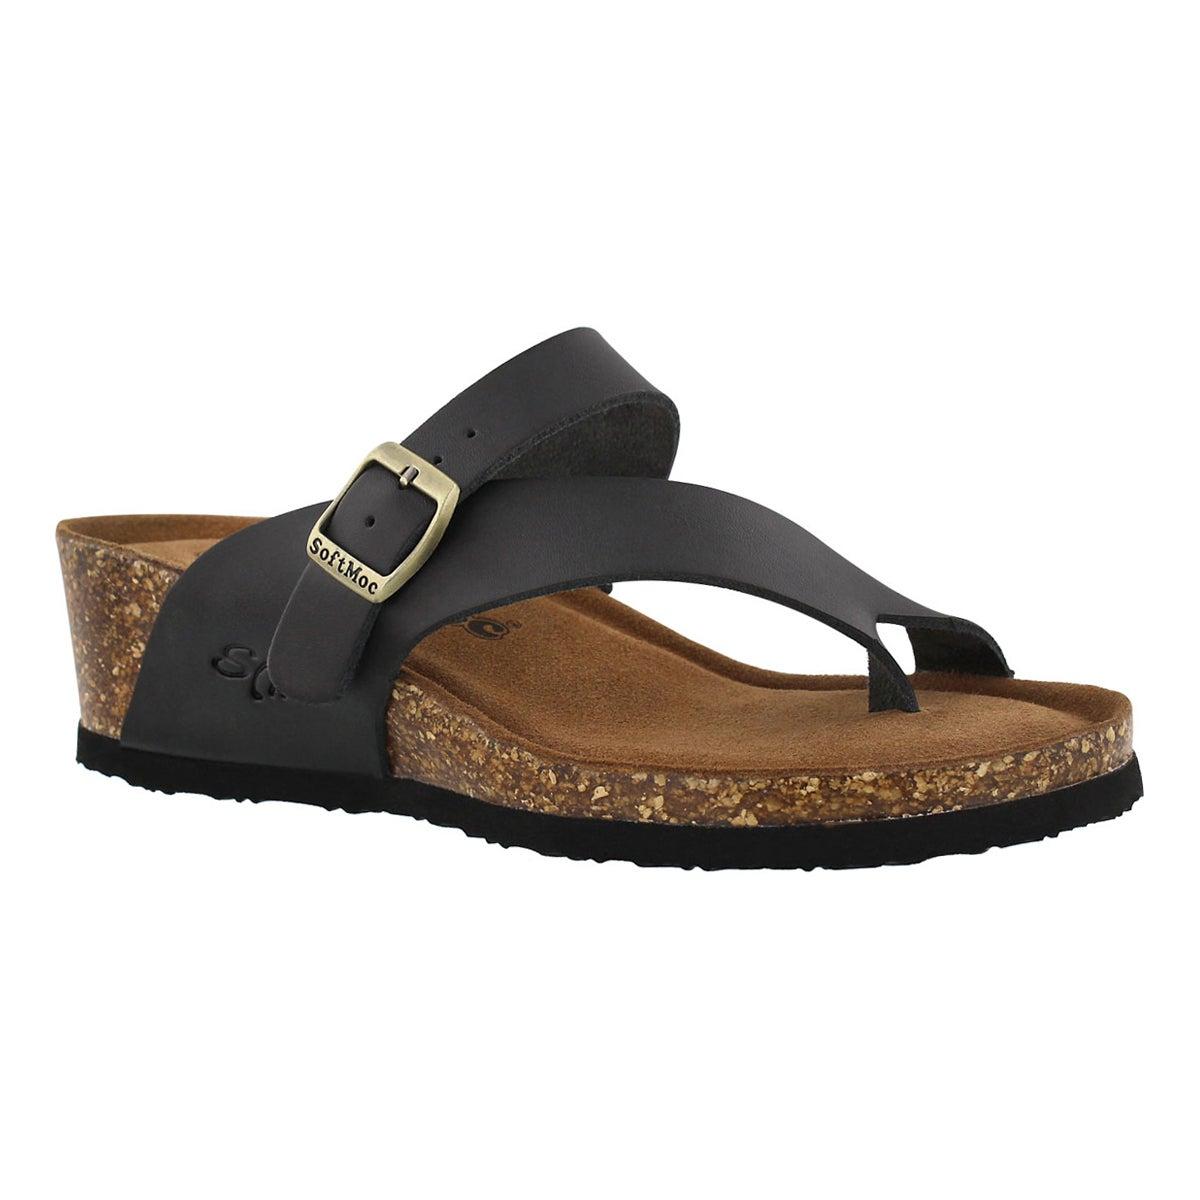 Women's AMBER 5 black memory foam wedge sandals